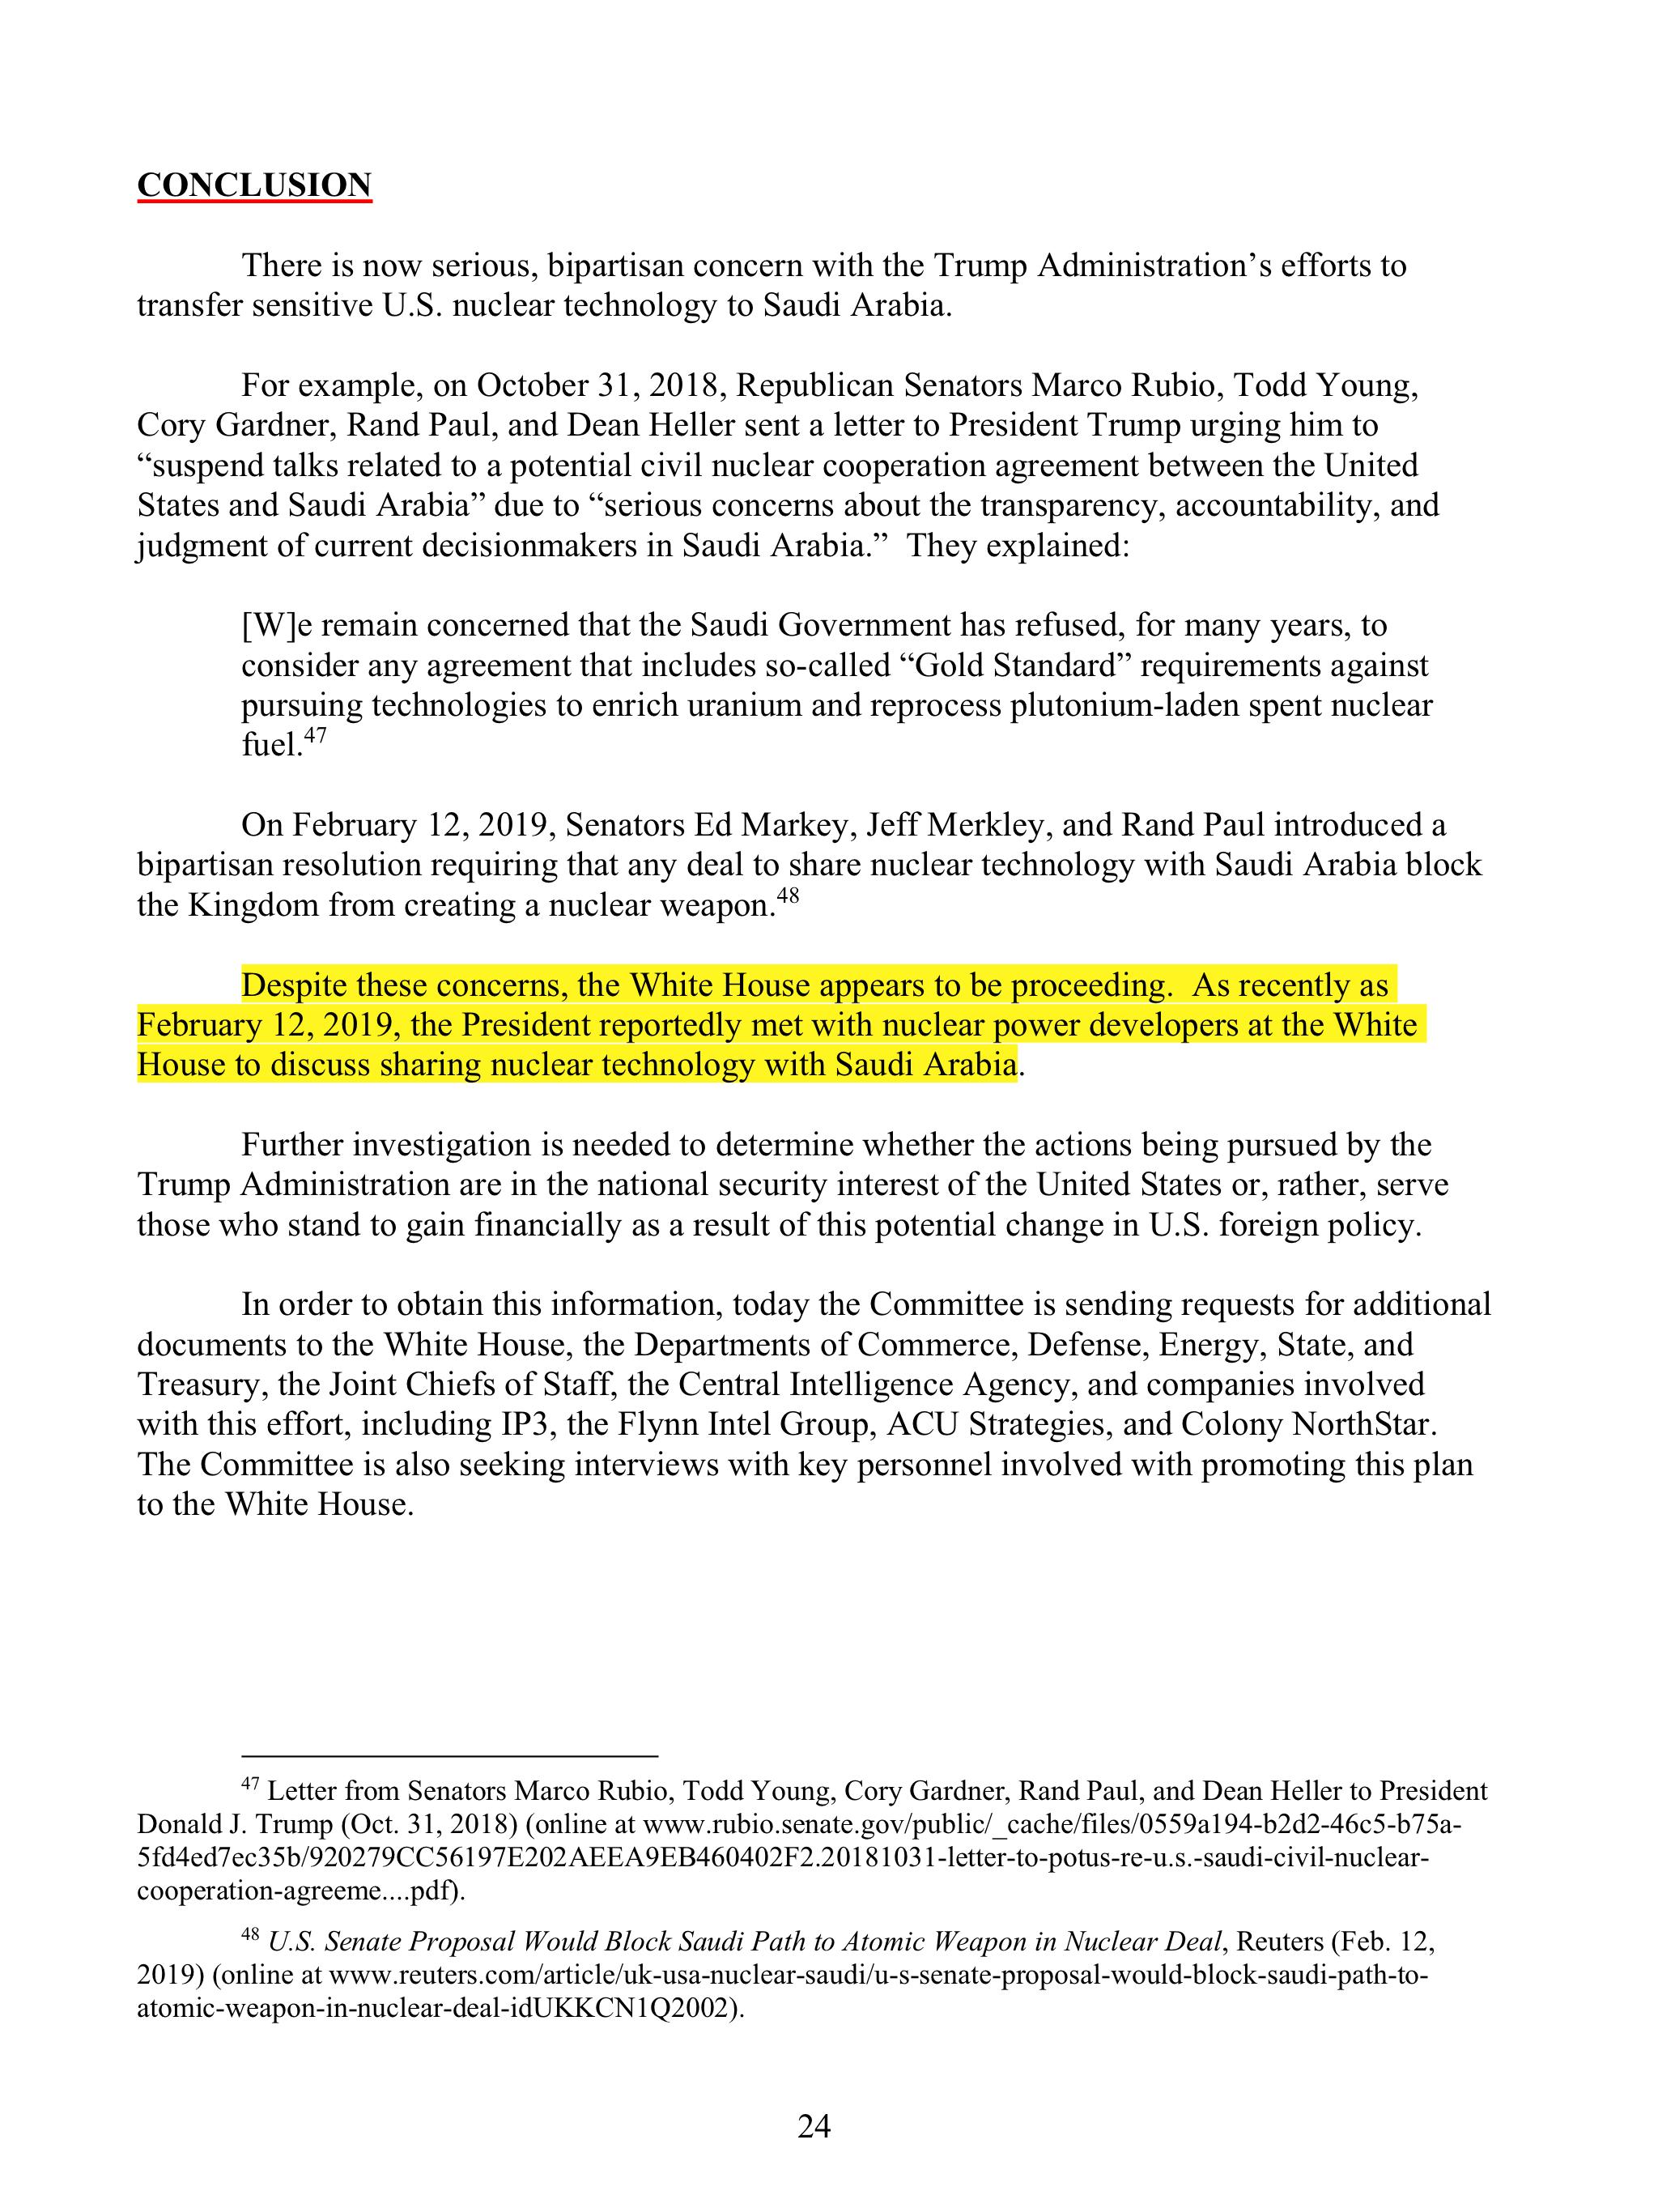 23 Whistleblowers Raise Grave Concerns with Trump